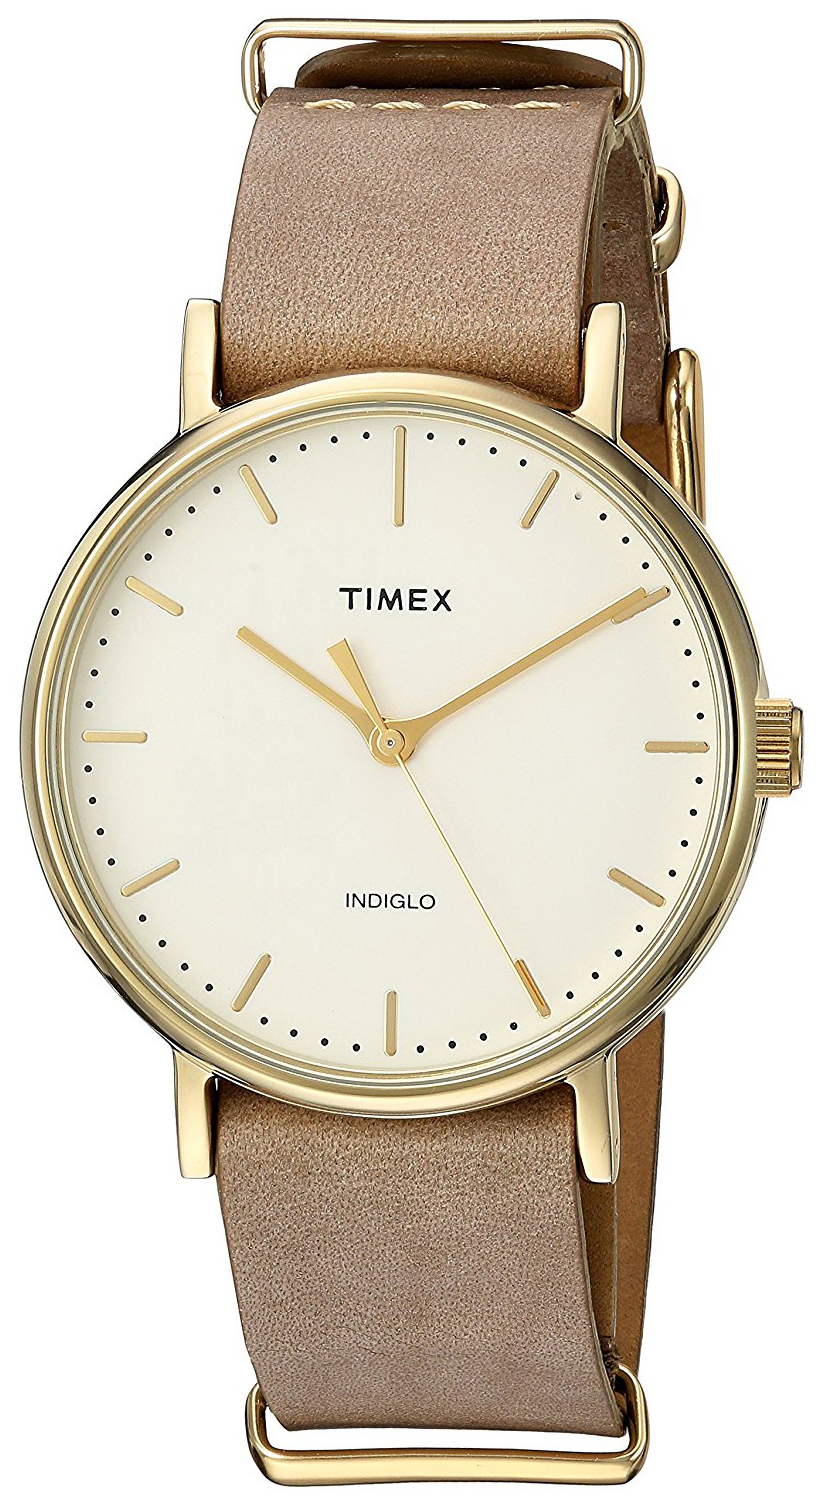 Timex Weekender Naisten kello TW2P98400 Samppanja/Nahka Ø37 mm